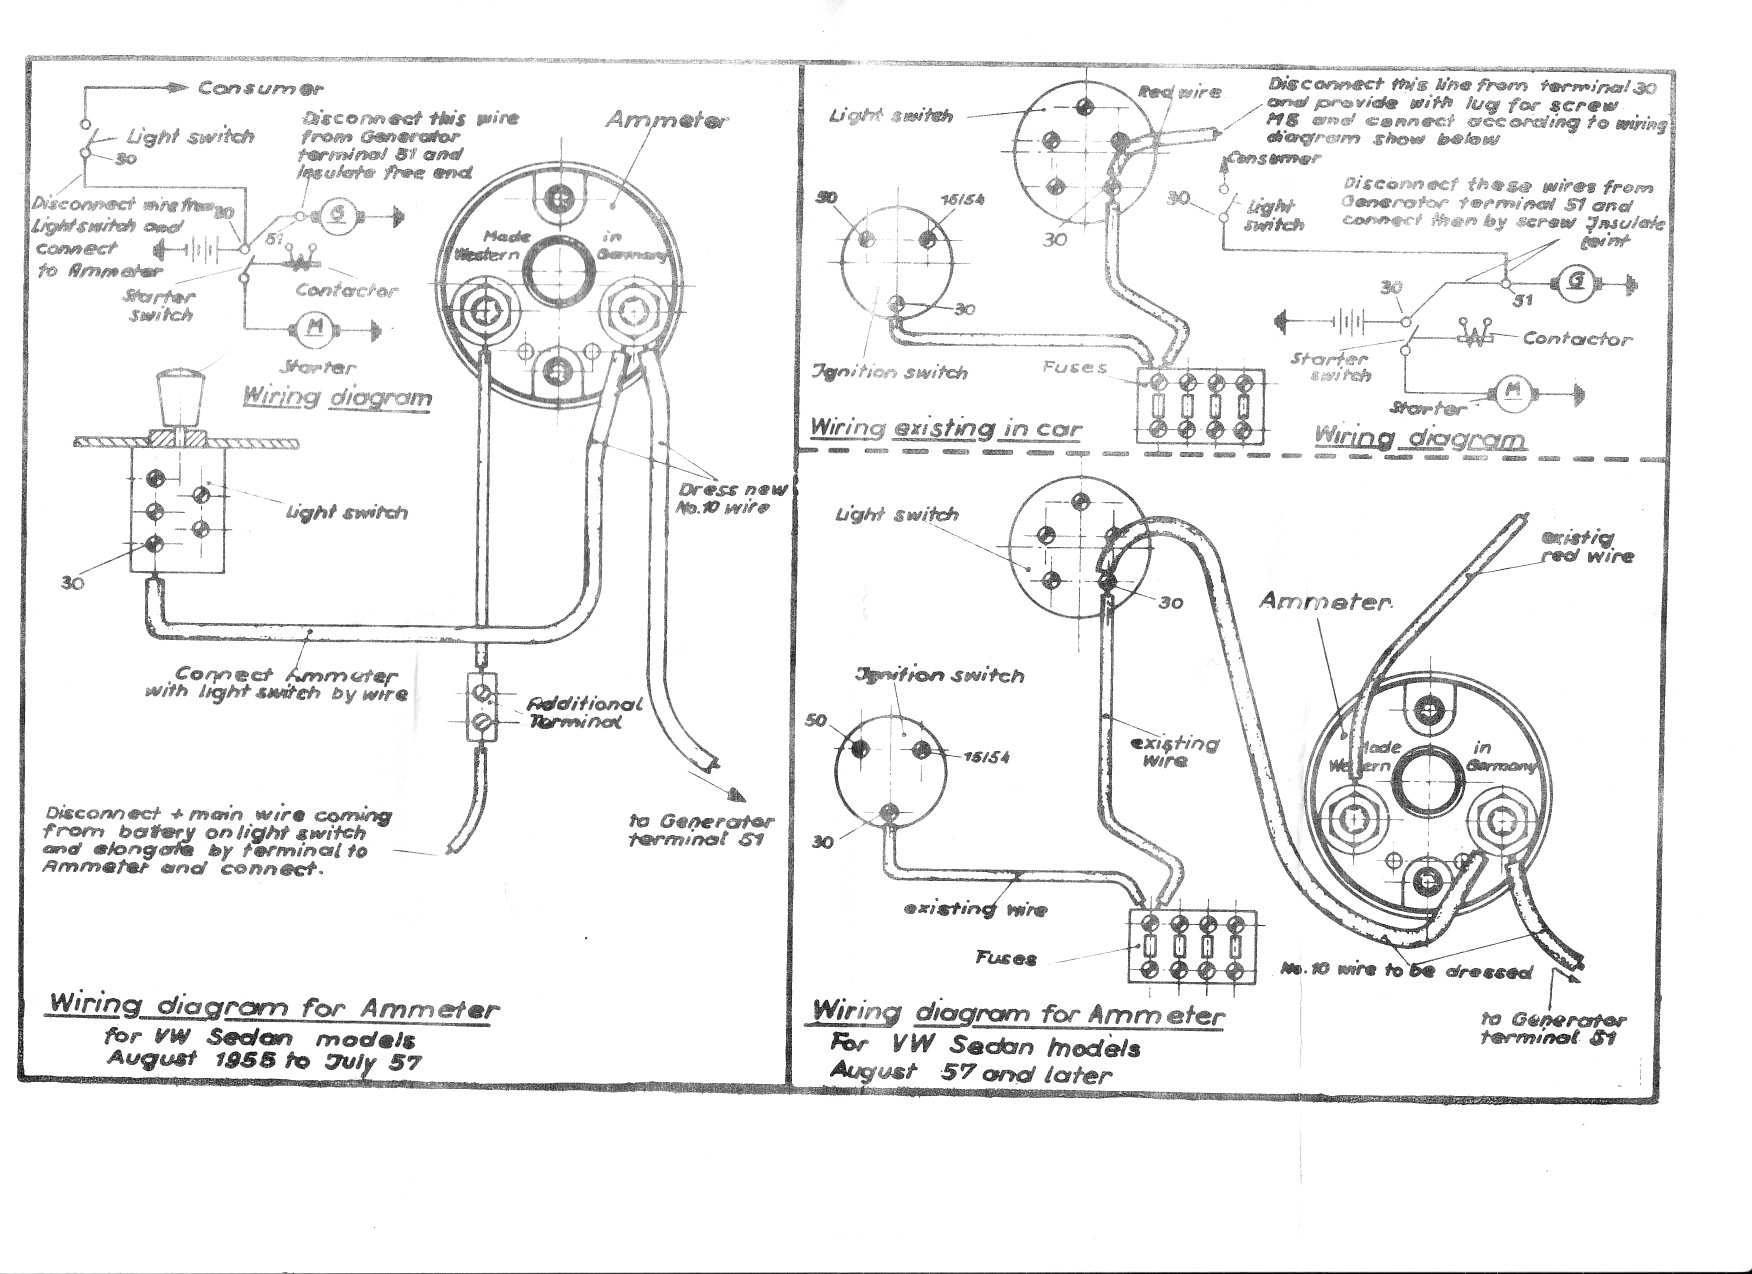 Sunpro Ammeter Wiring Diagram - free download wiring diagrams